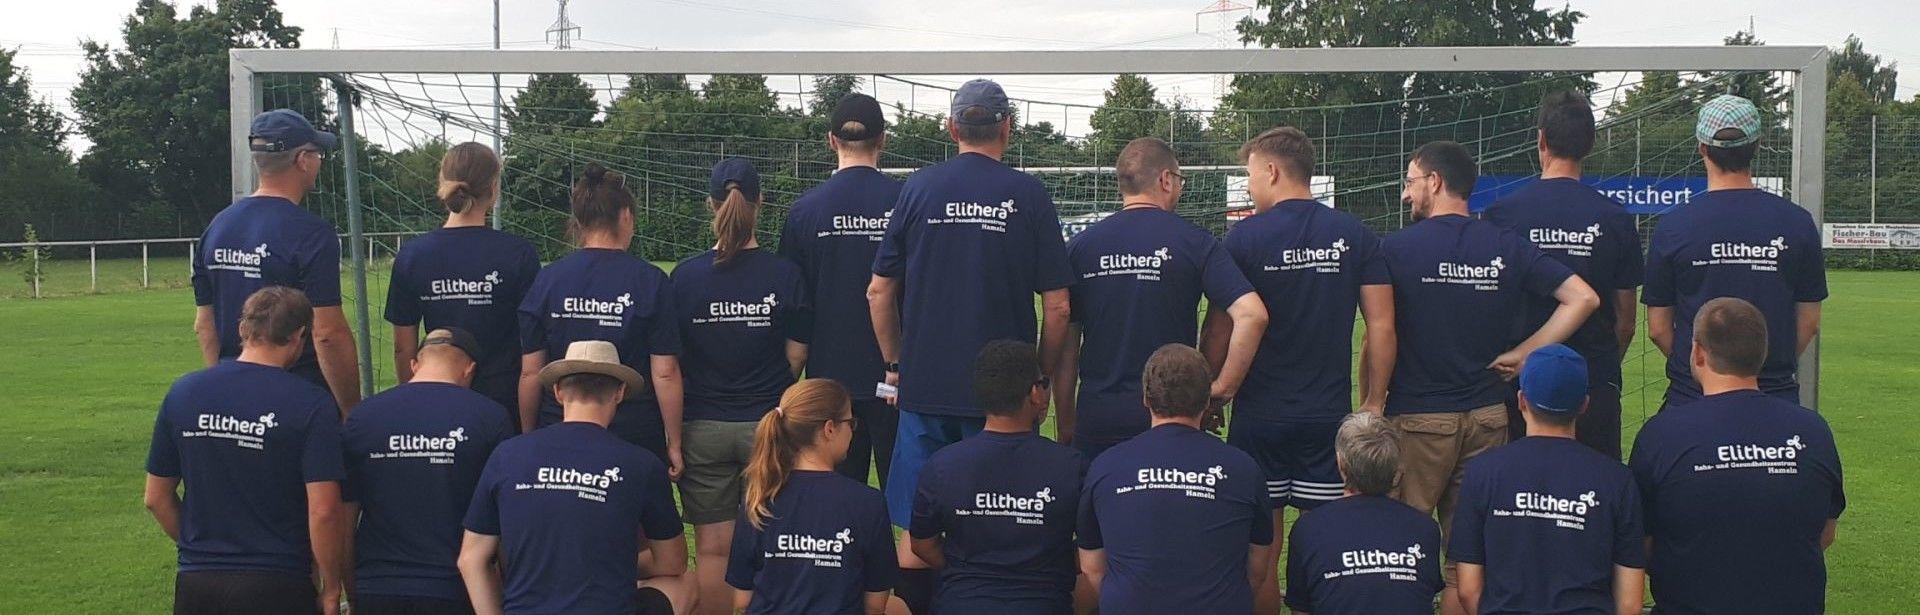 Elithera sponsert Soccercamp für Kinder